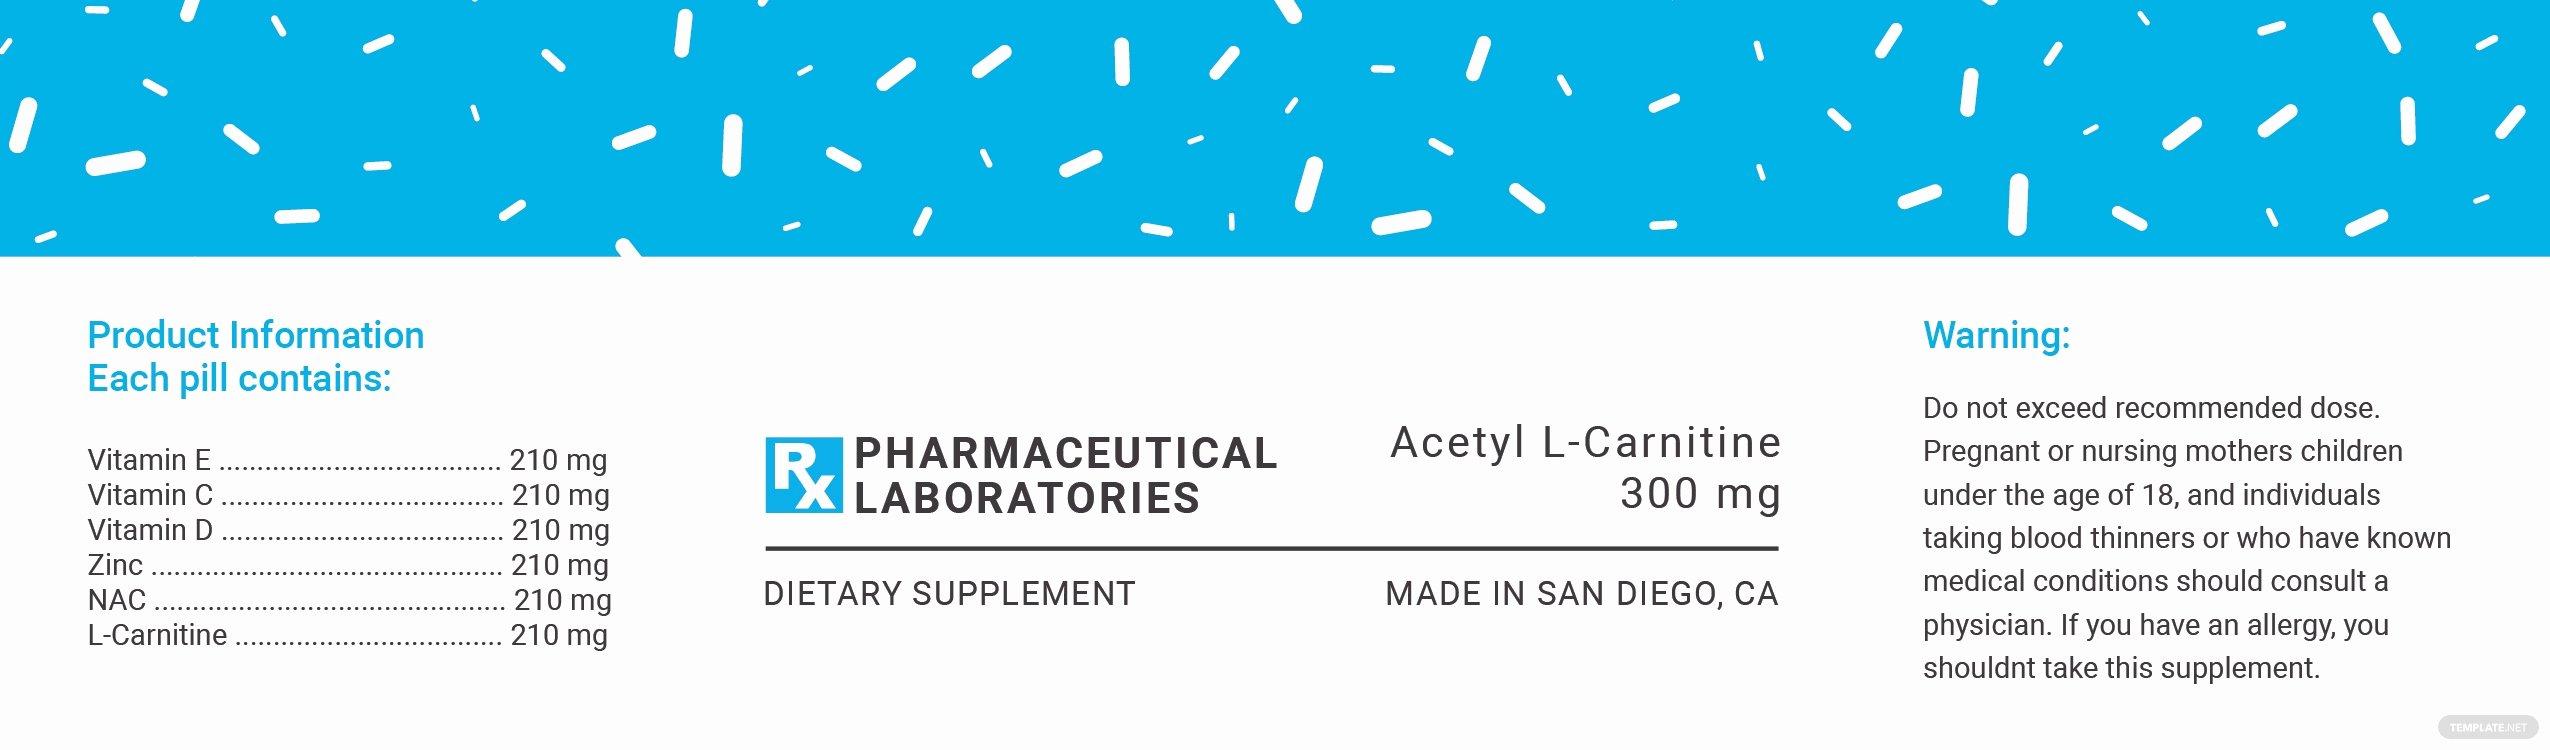 Prescription Pill Bottle Label Template Awesome Free Pill Bottle Label Template In Psd Ms Word Publisher